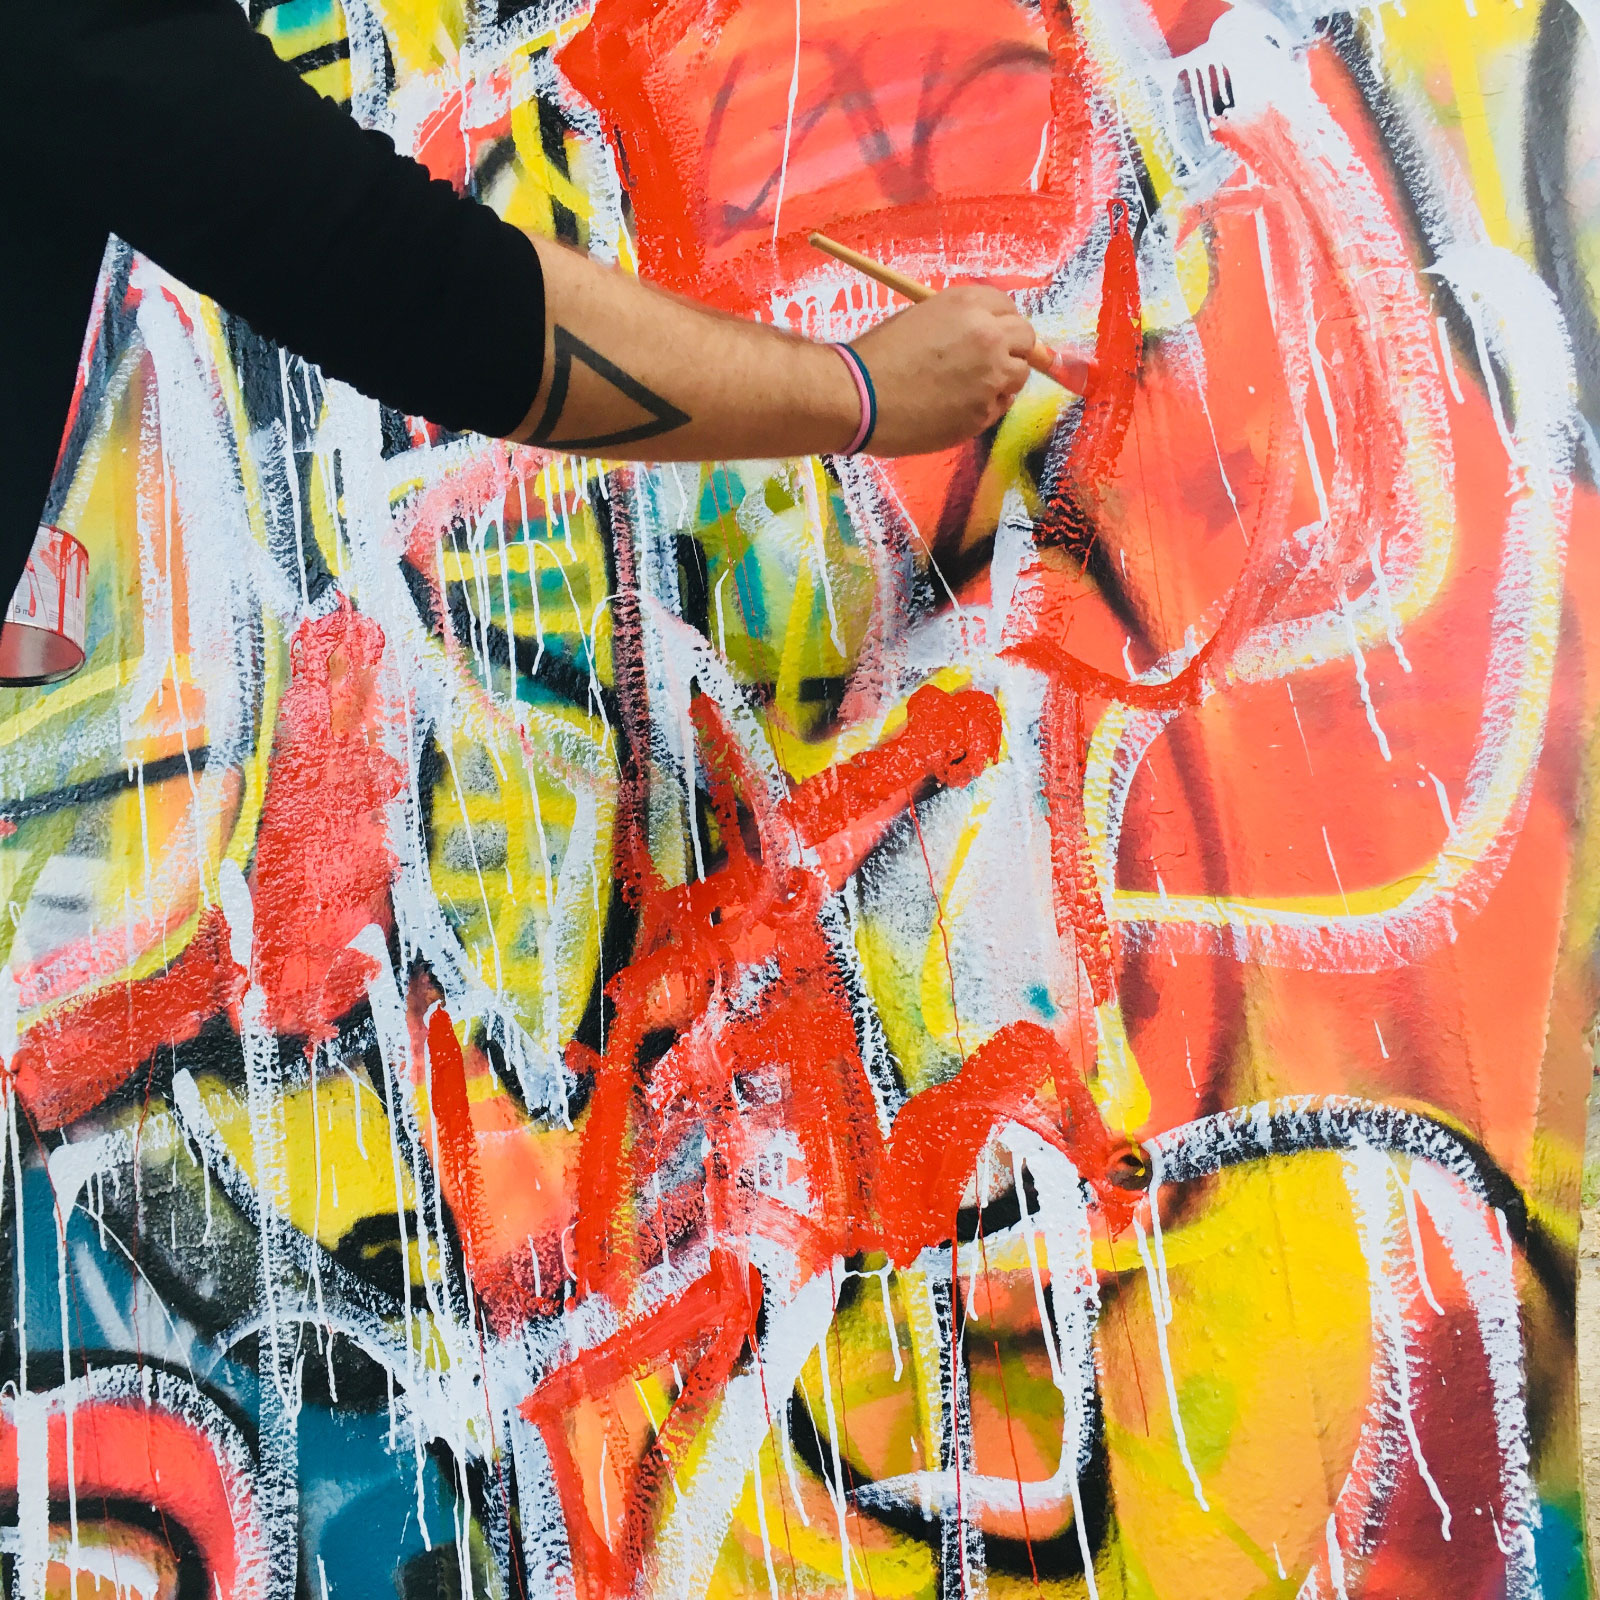 Rob_Adalierd_Painting_Vienna_Abstract_Contemporary_Street_art_2.jpg